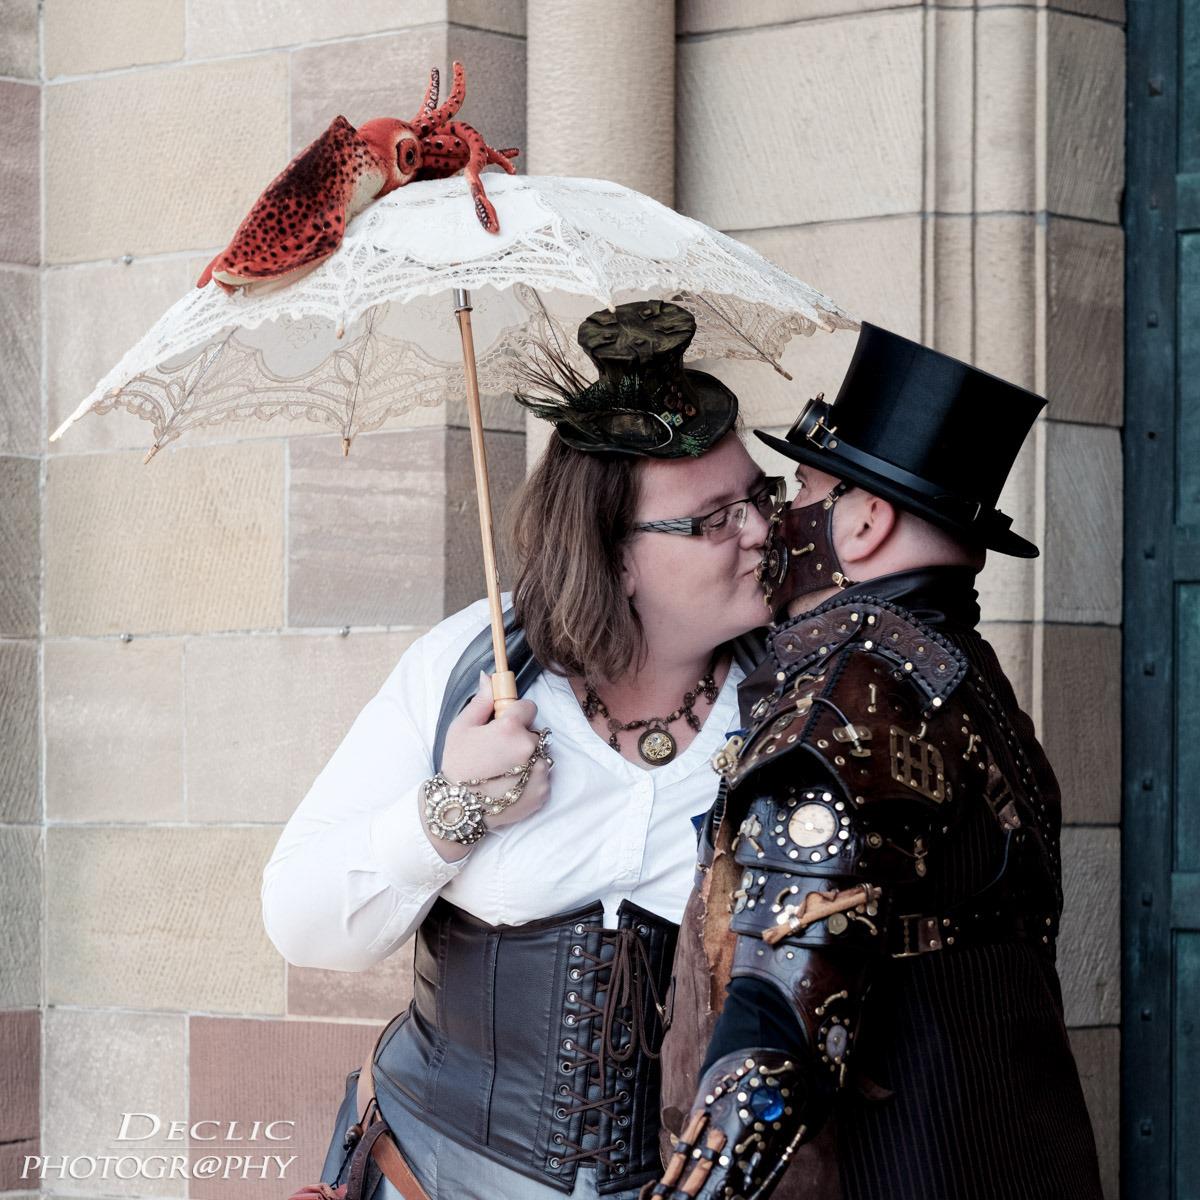 Steampunk kisses